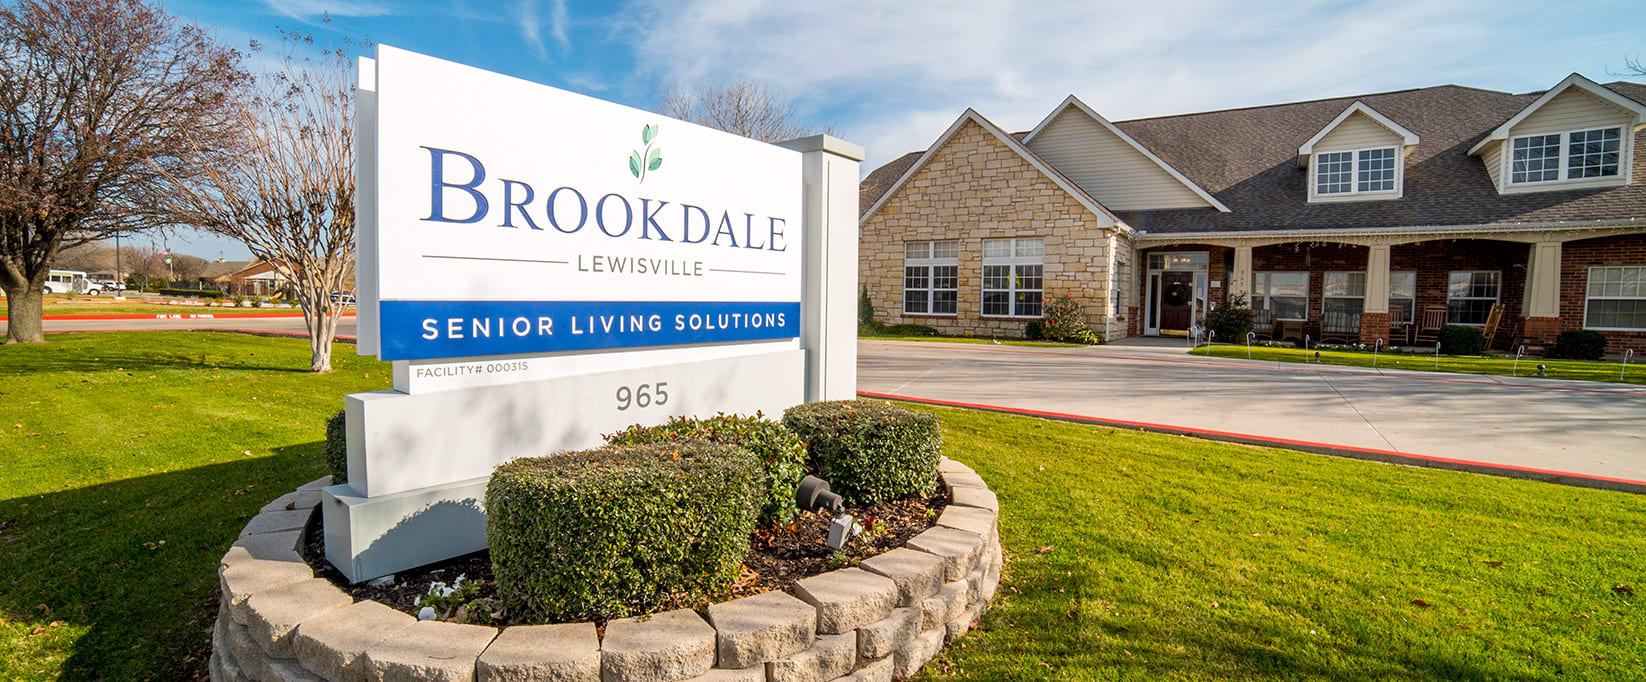 Photo 1 of Brookdale Lewisville